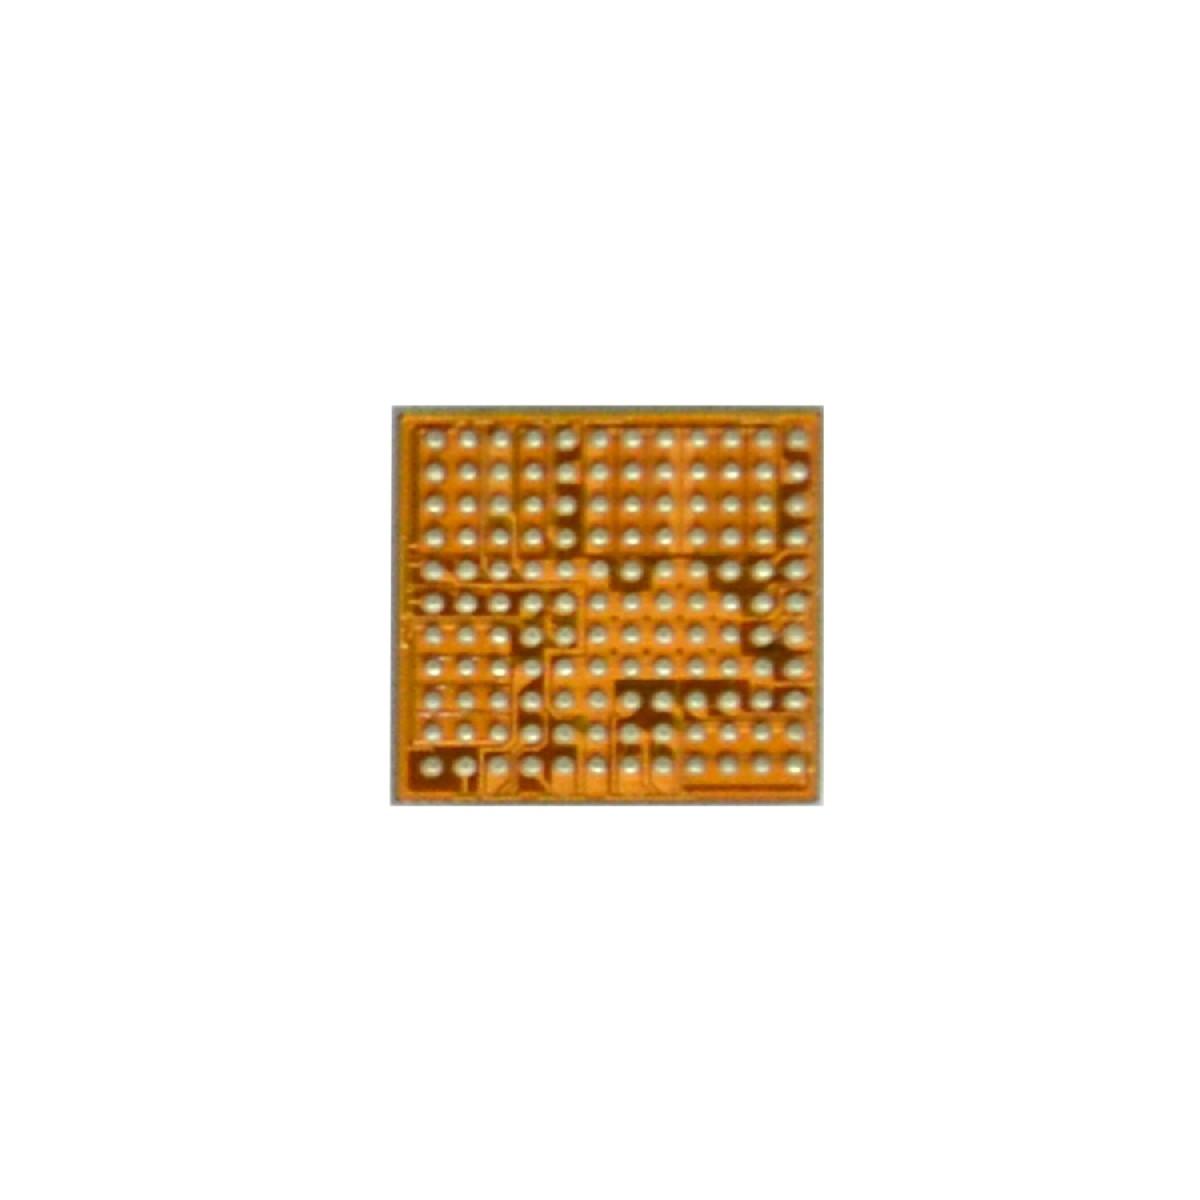 "Charge IC Chip 00121 για Apple iPad Pro 10.5"" OEM Type A"